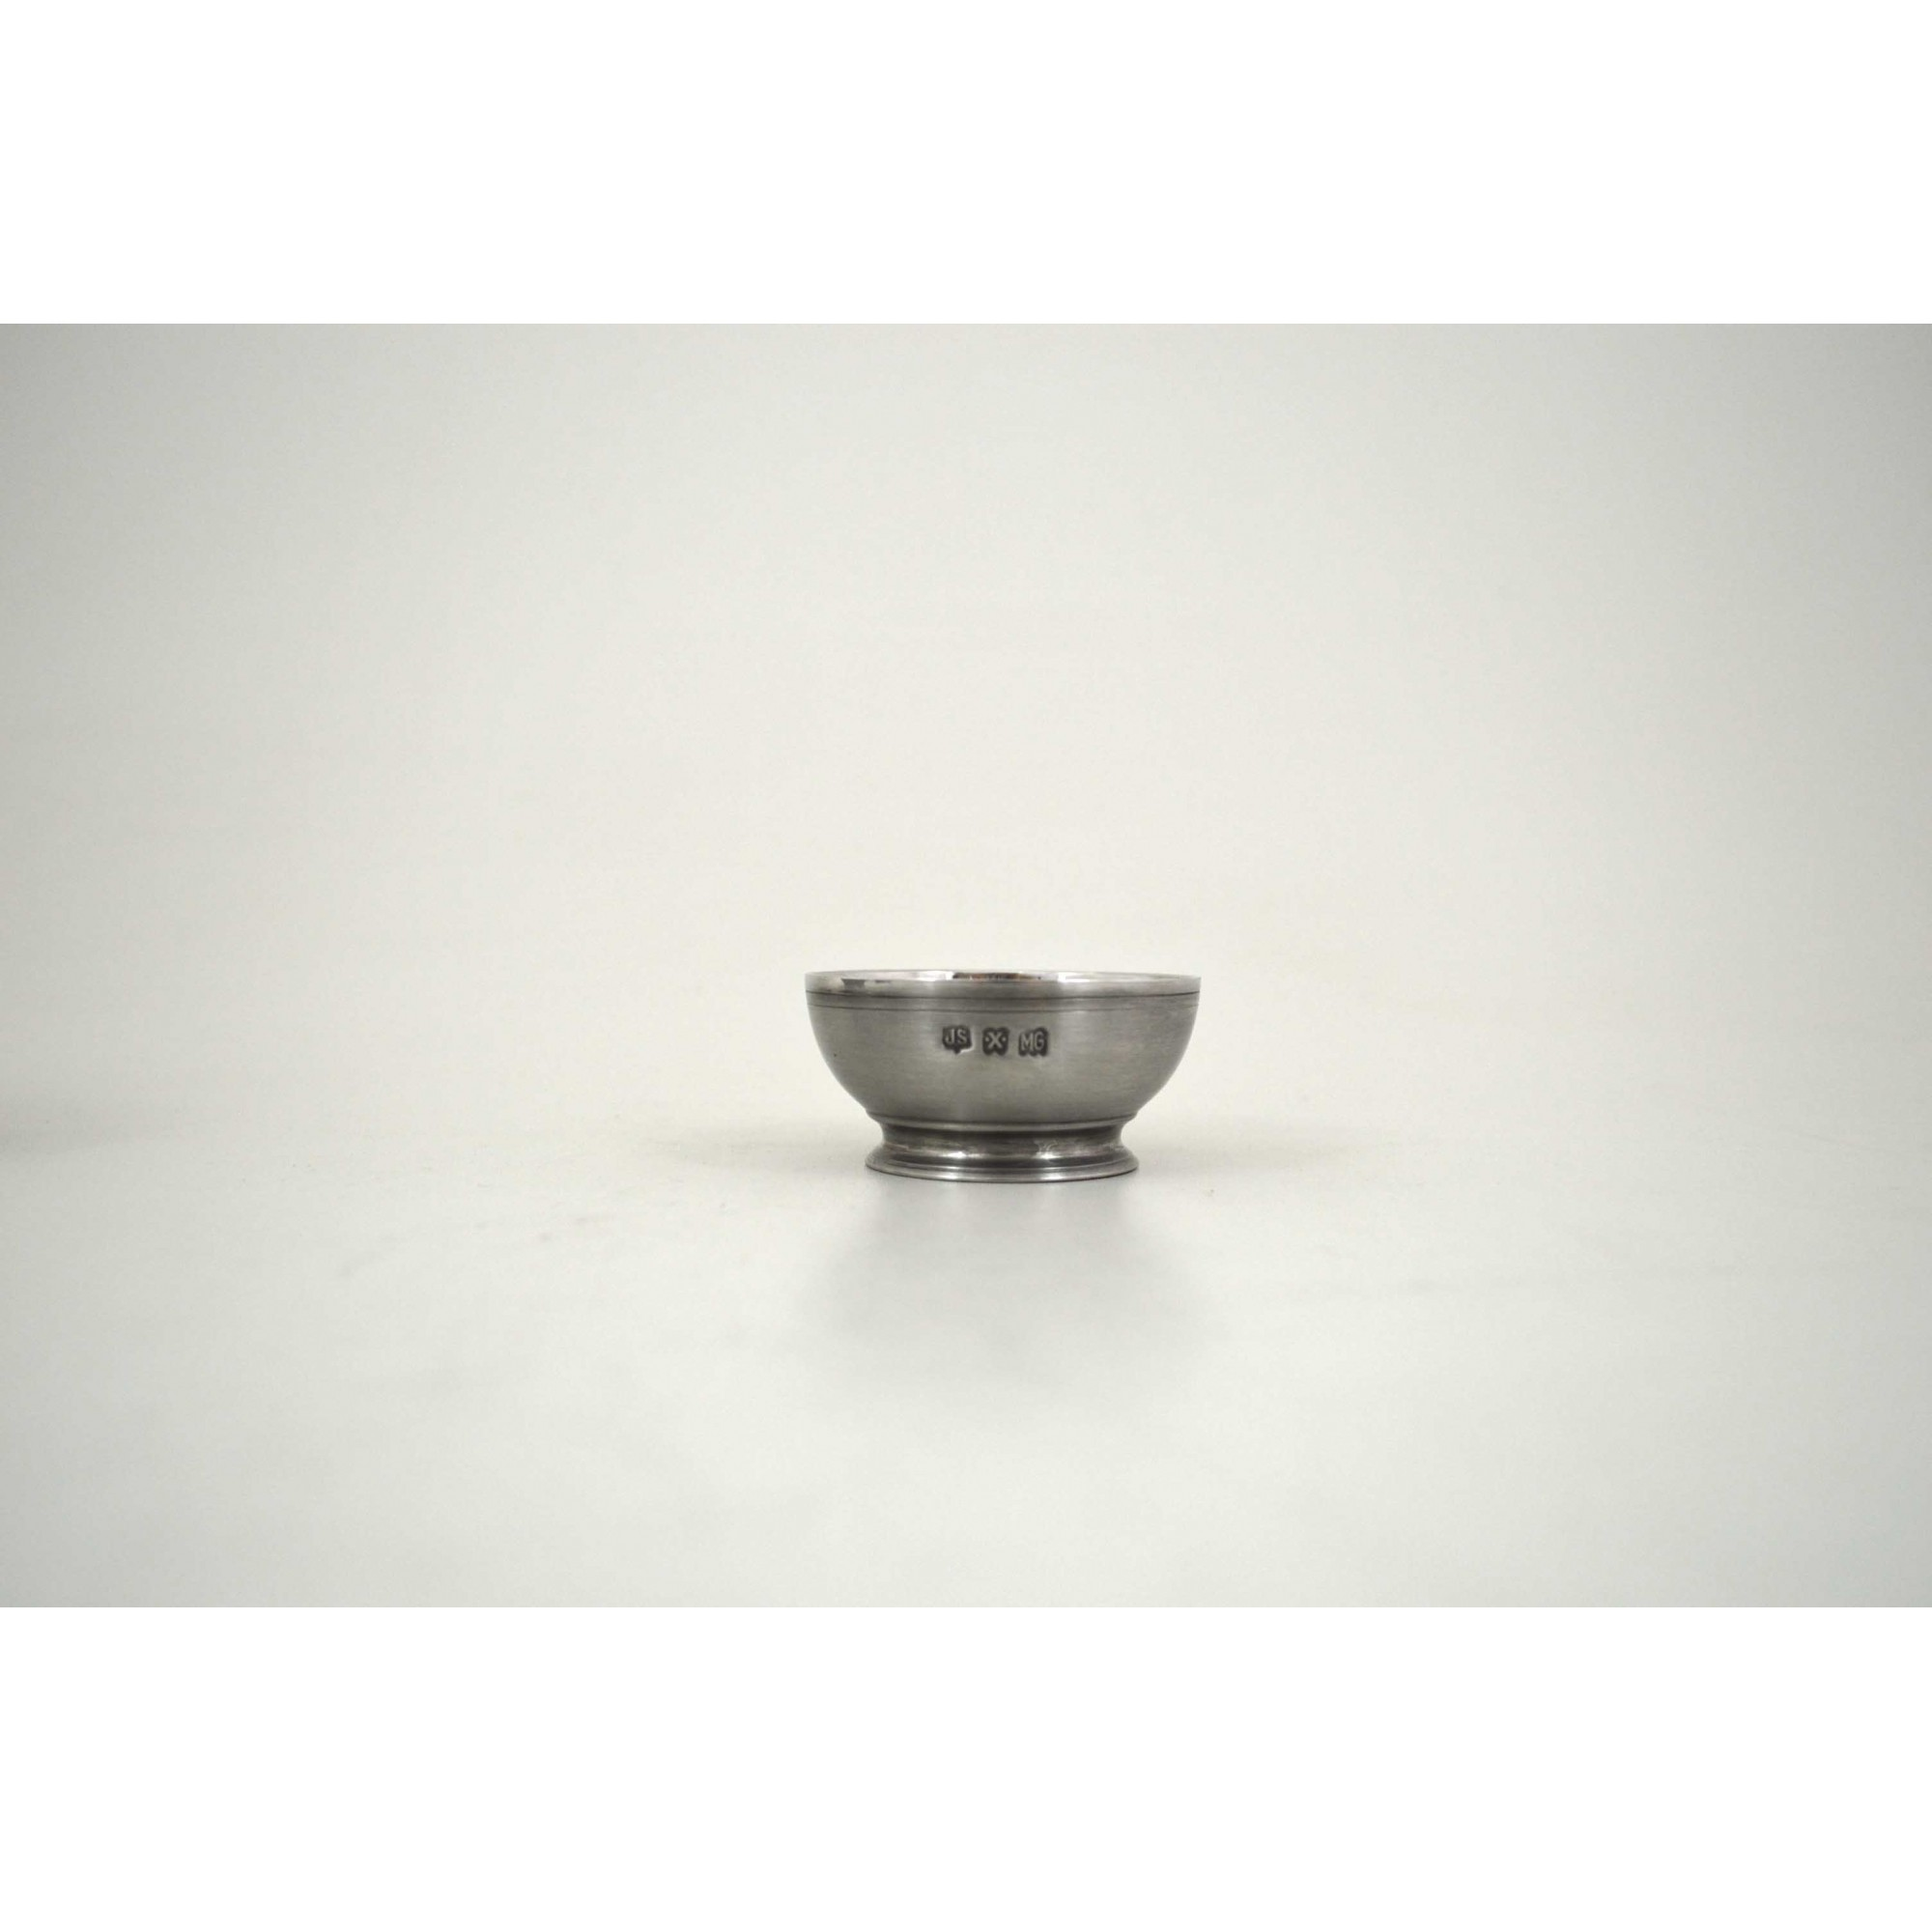 Tigela Inglesa - diâmetro 7 cm (P3C)